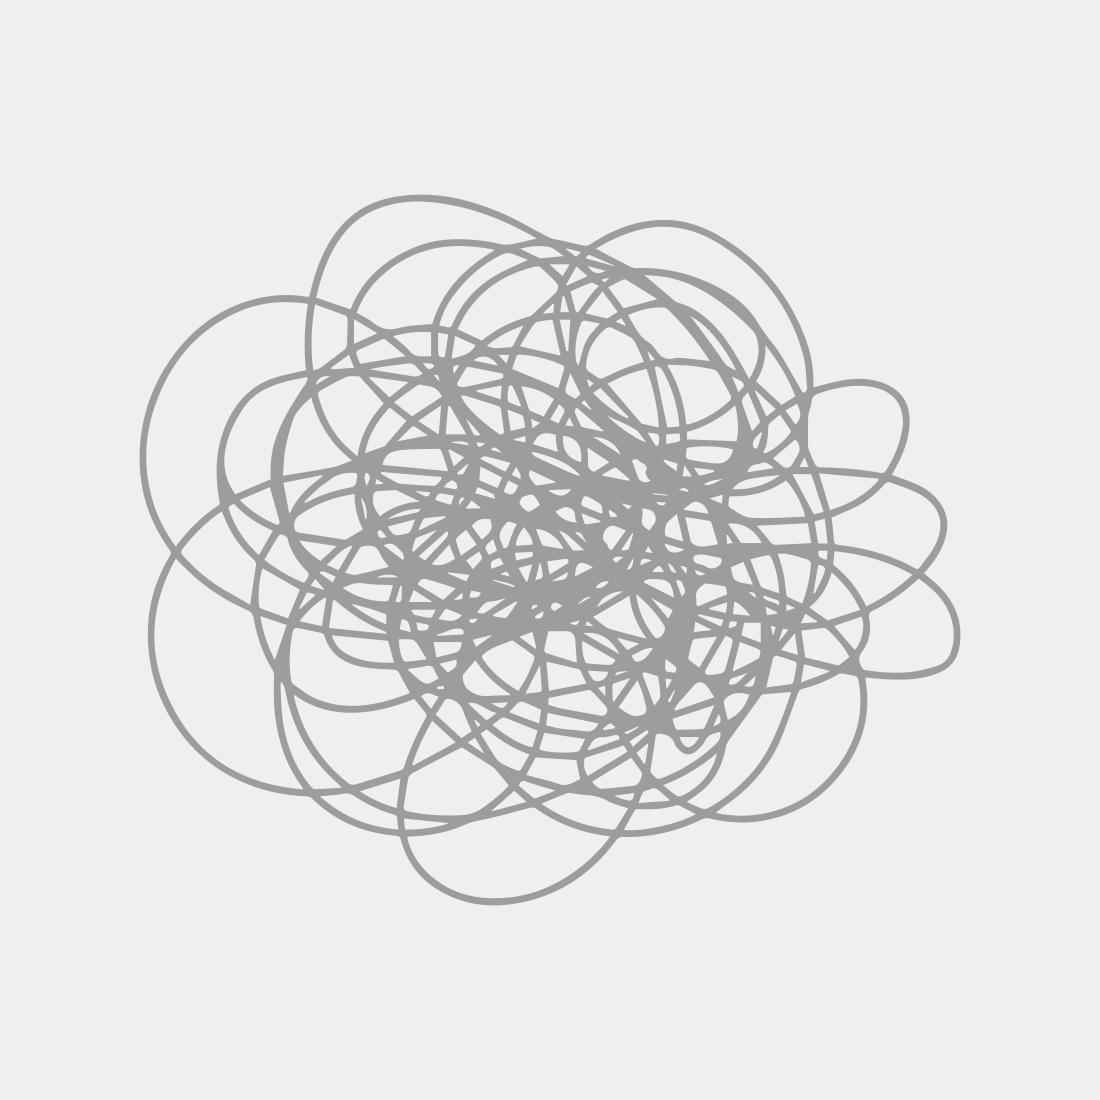 Allen Jones Special Edition Catalogue and Print